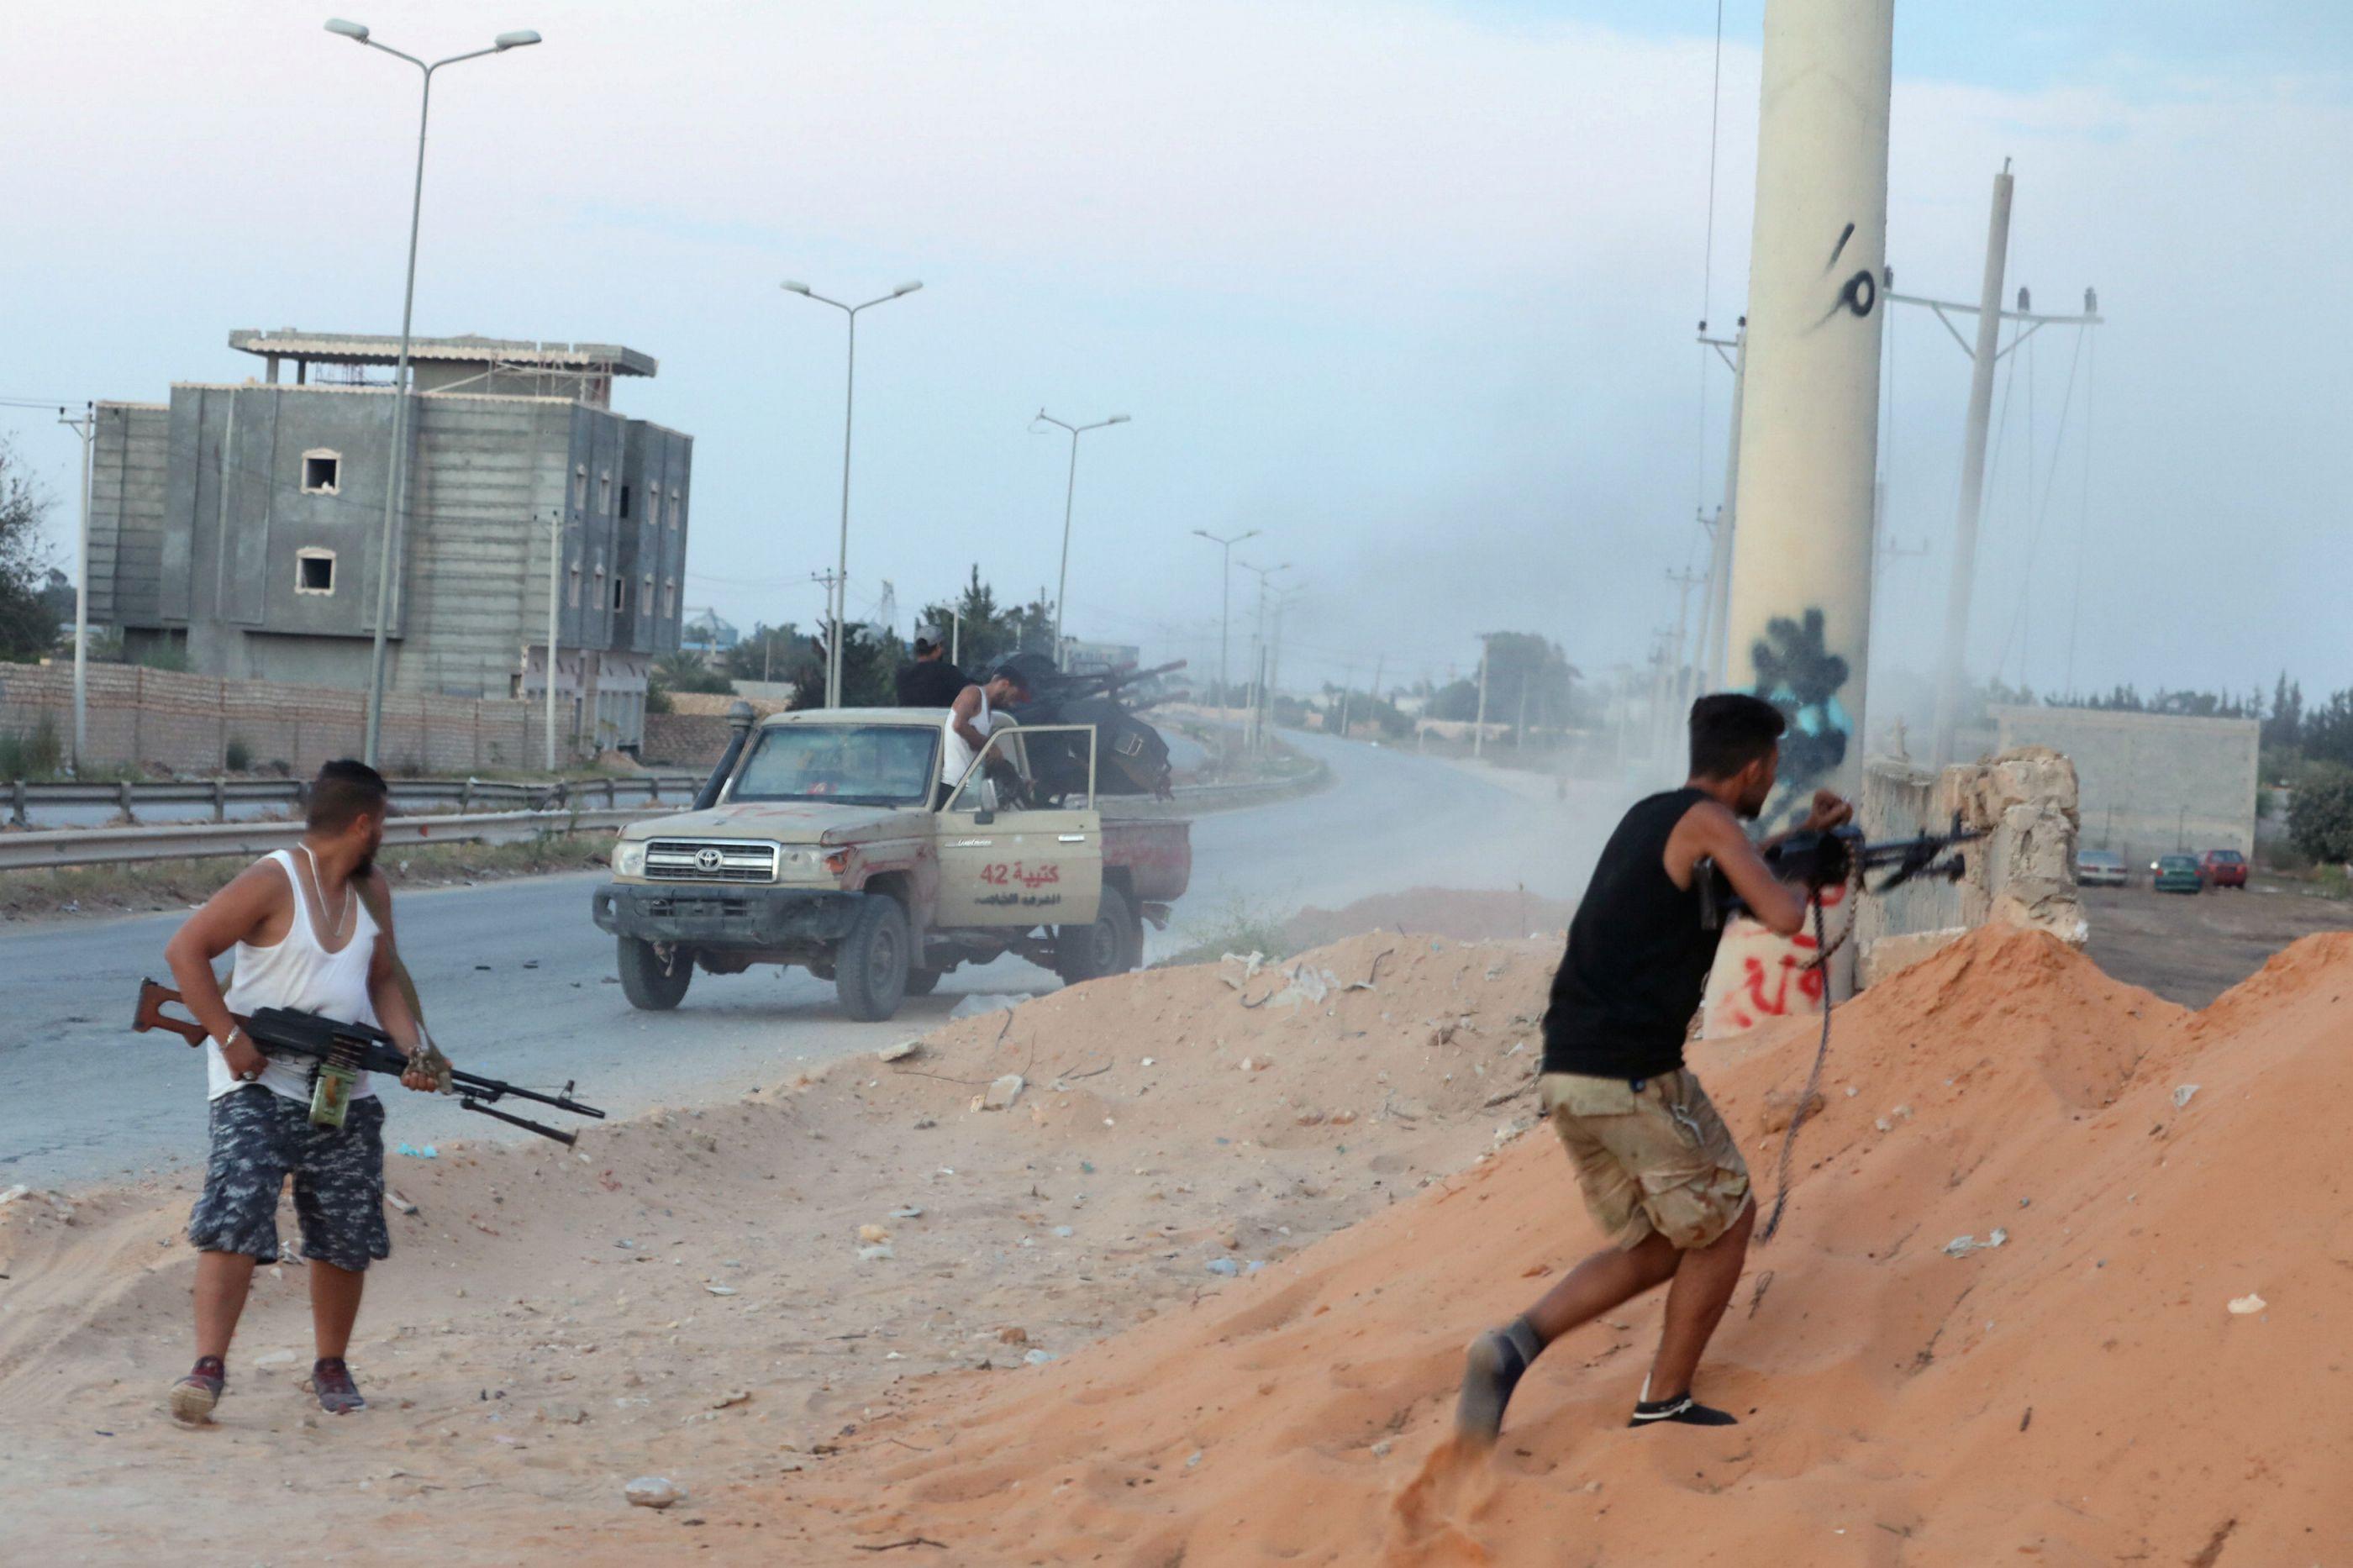 Tripoli consegue travar avanço de forças do marechal líbio Khalifa Haftar